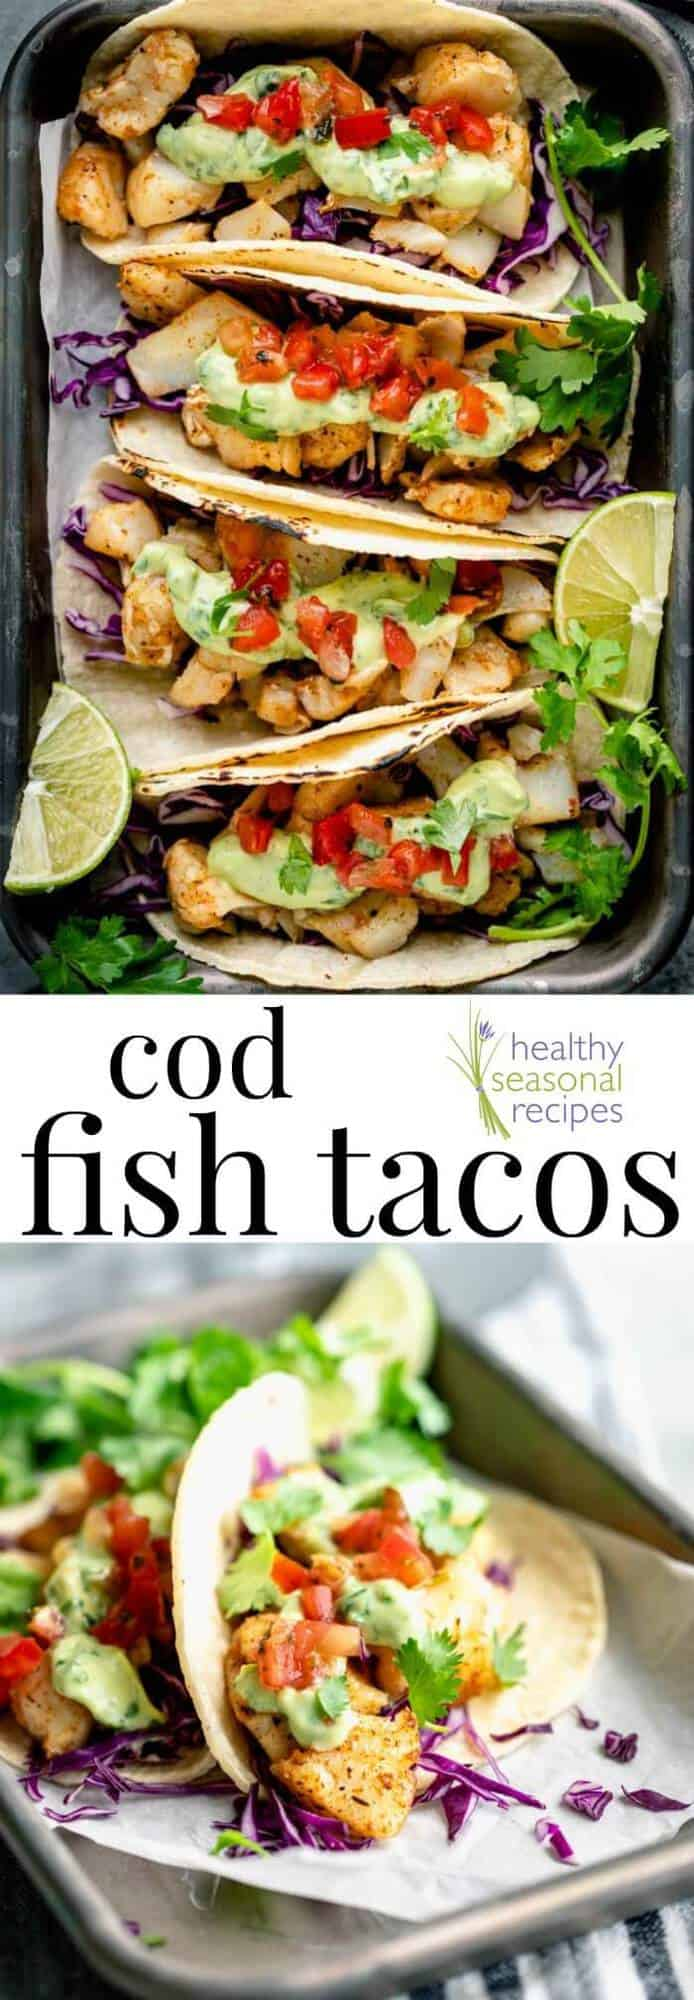 Fresh Cod Fish Tacos with healthy avocado crema, pico de gallo and shredded cabbage is a 20 minute dinner the the whole family will enjoy! #healthyseasonal #codfish #cod #fishtacos #tacos #mexicanfood #20minuterecipe #glutenfree